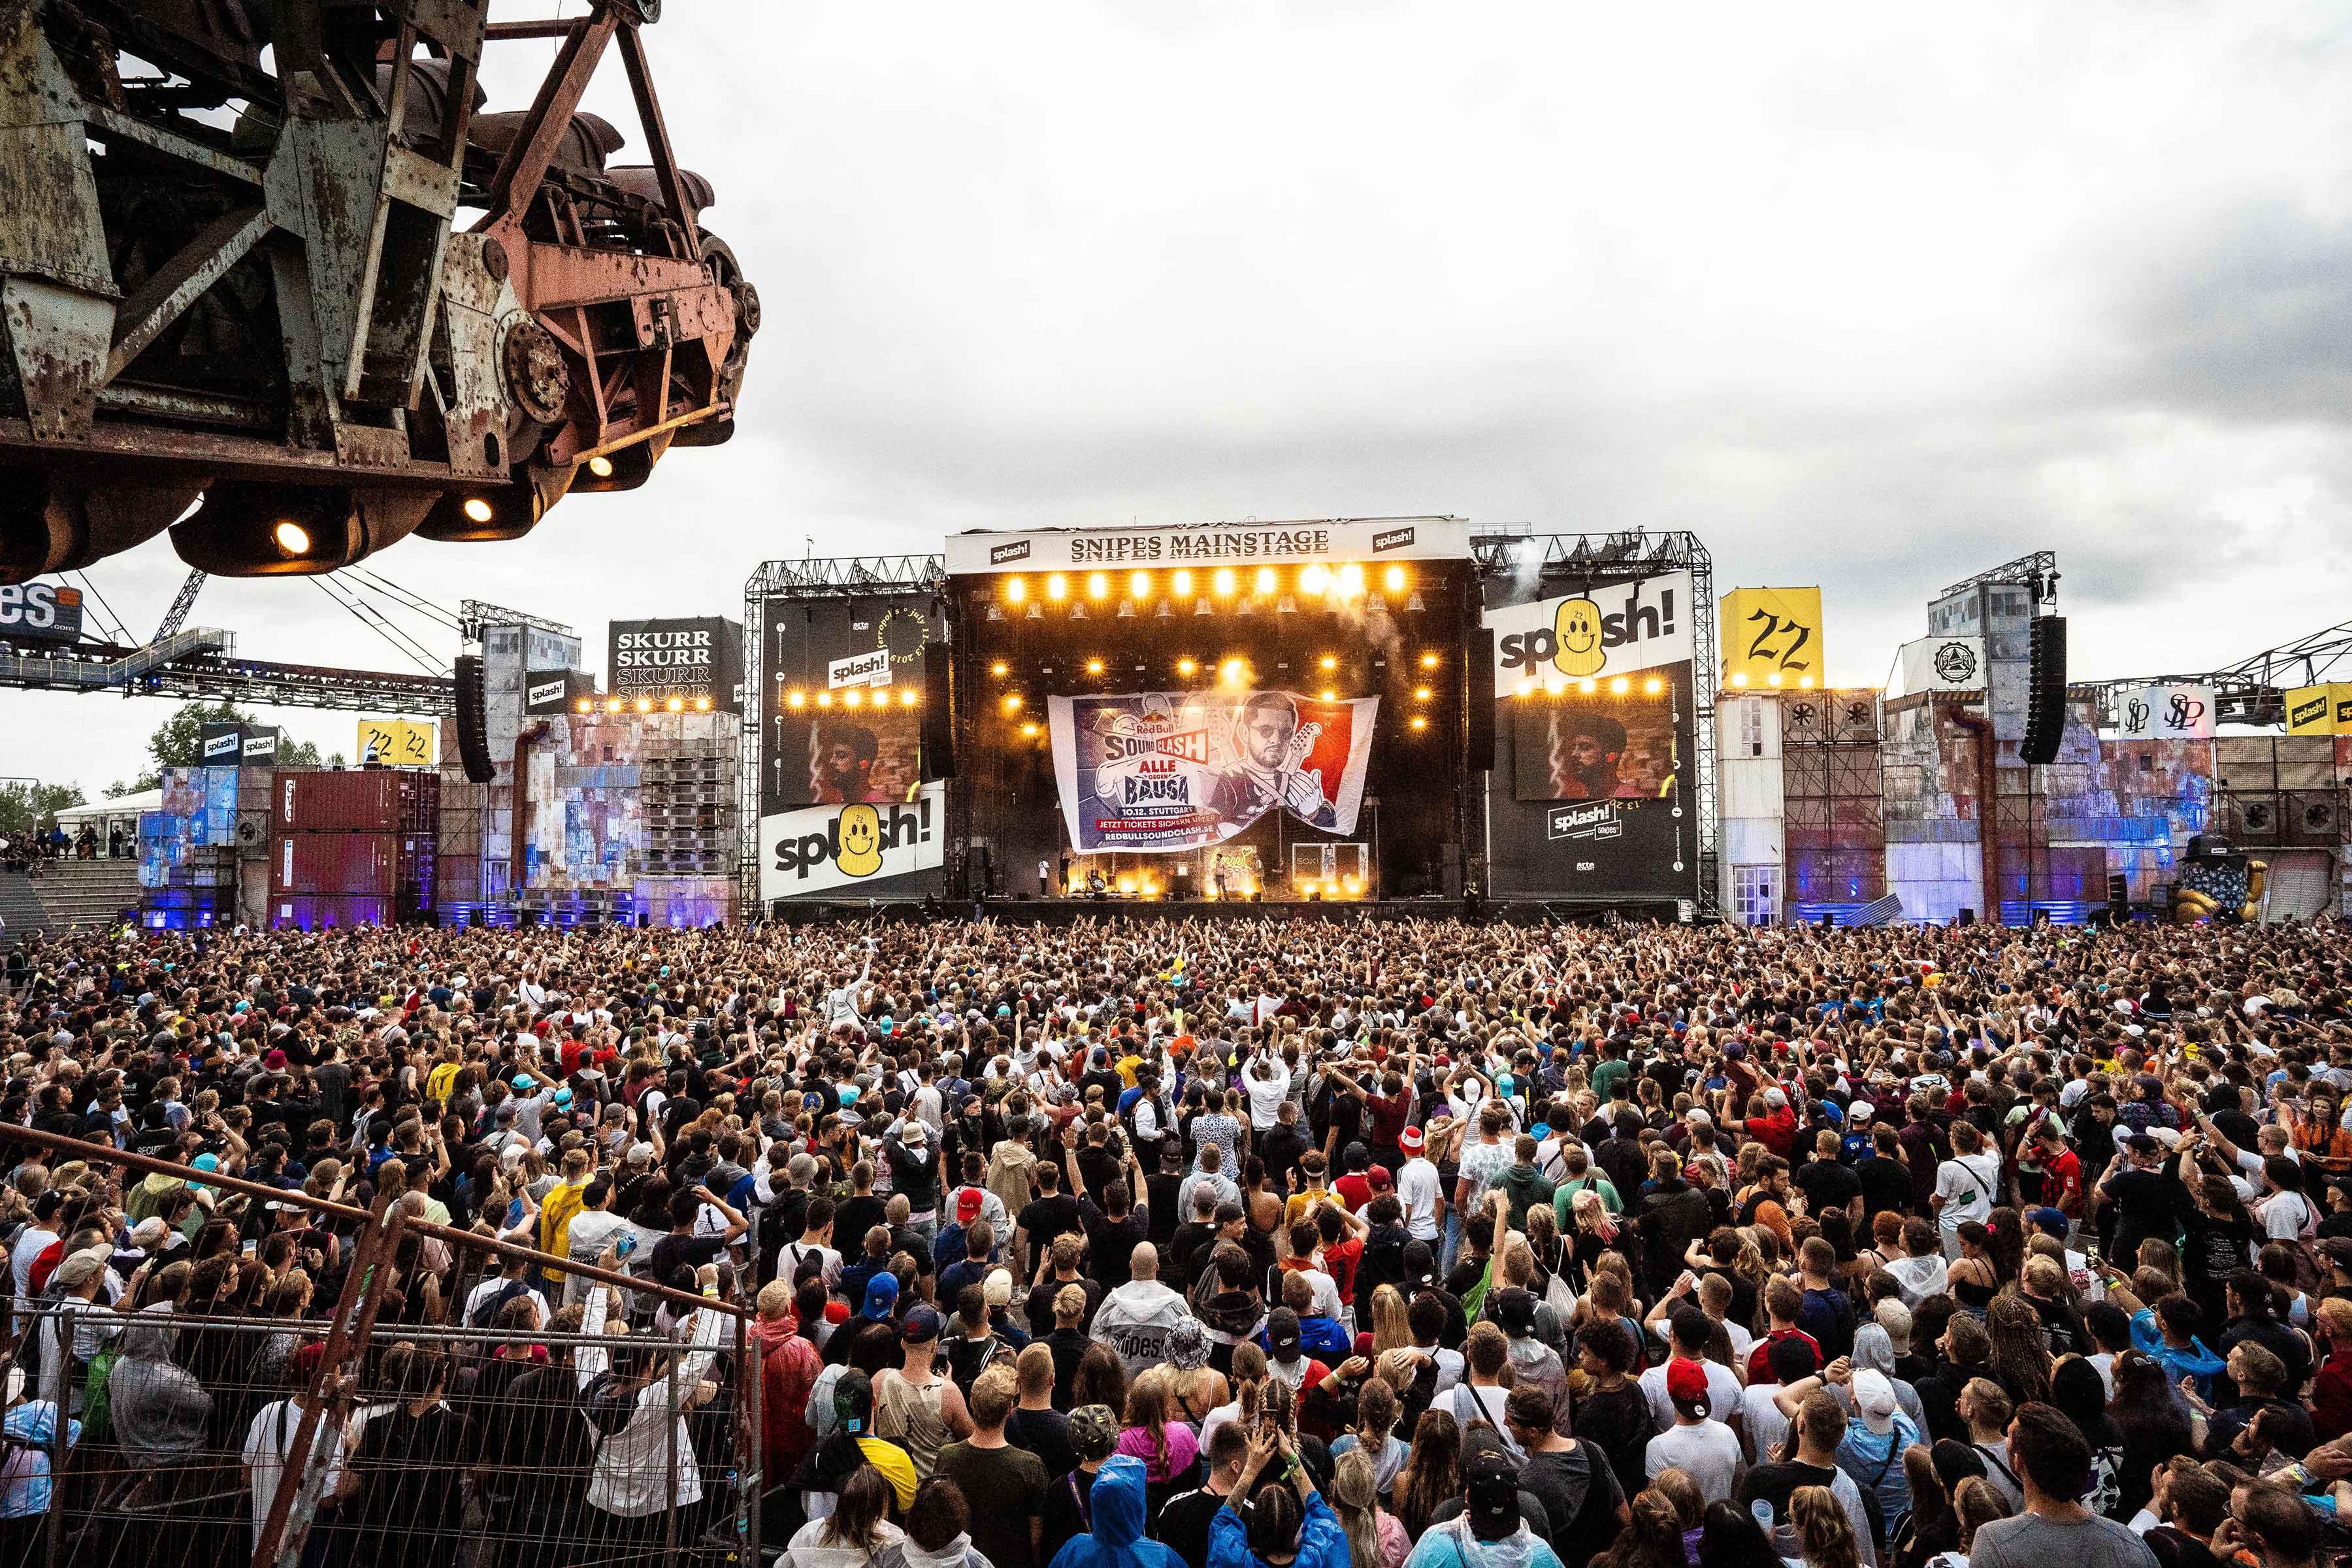 Red Bull Soundclash 2019 Bausa Stellt Sich Jeder Konkurrenz